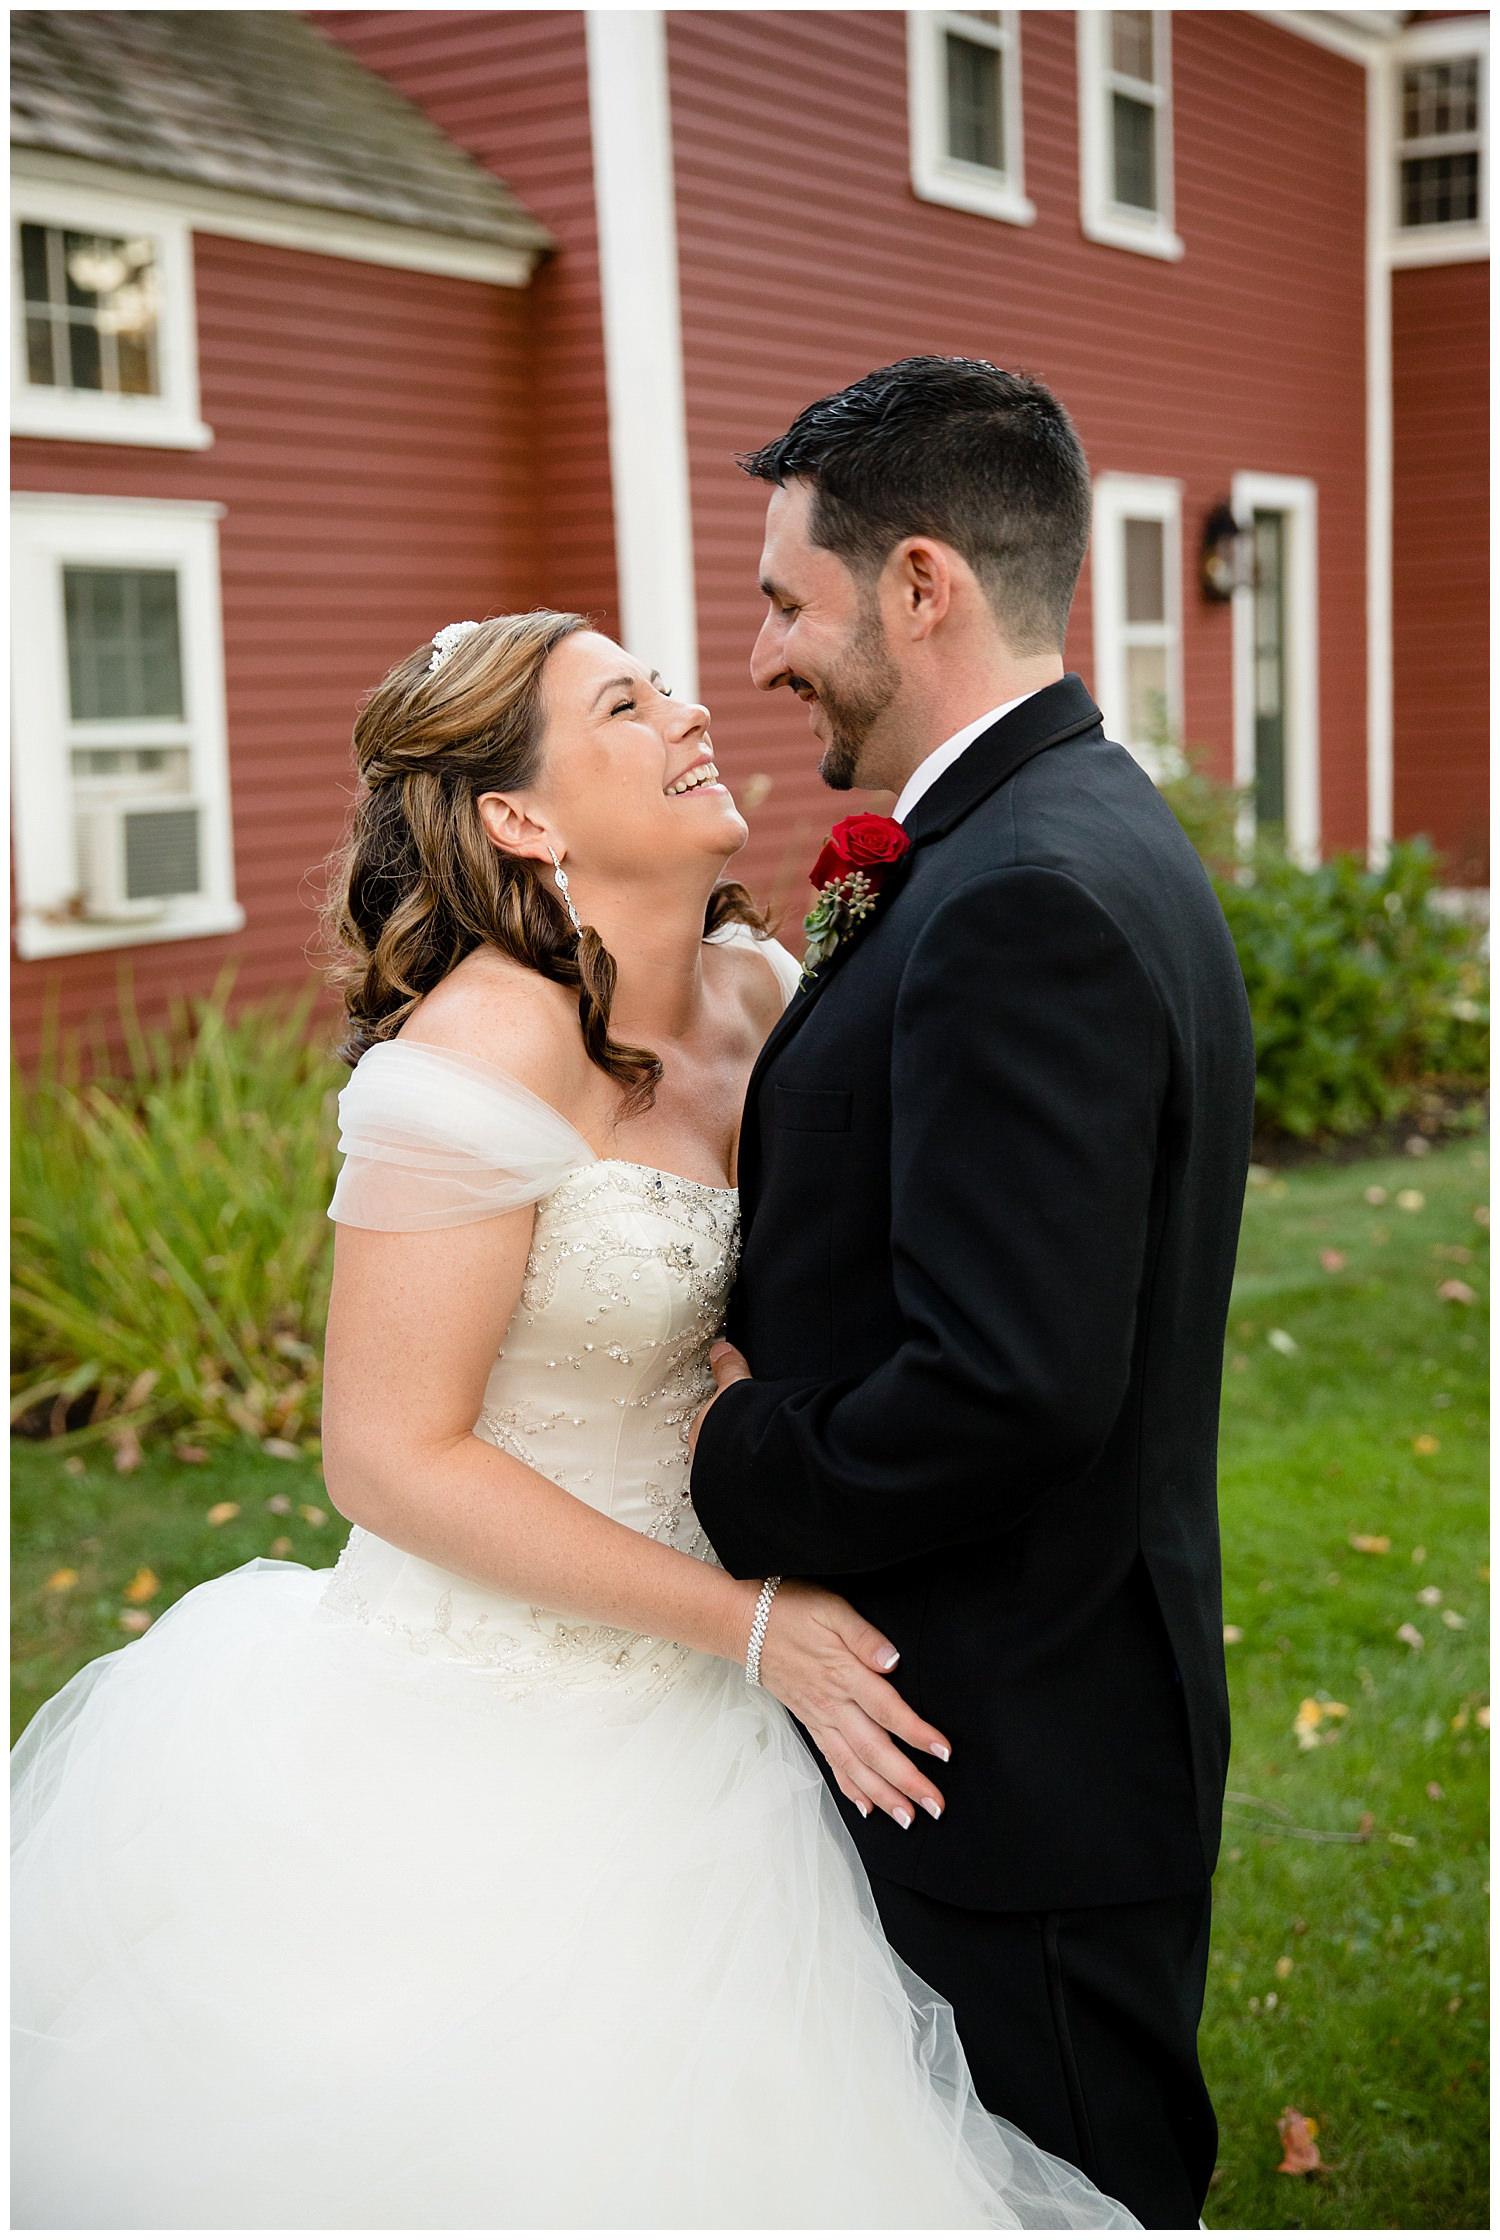 smith-barn-brooksby-farm-wedding-26-north-studios-boston-wedding-photographer-034.jpg